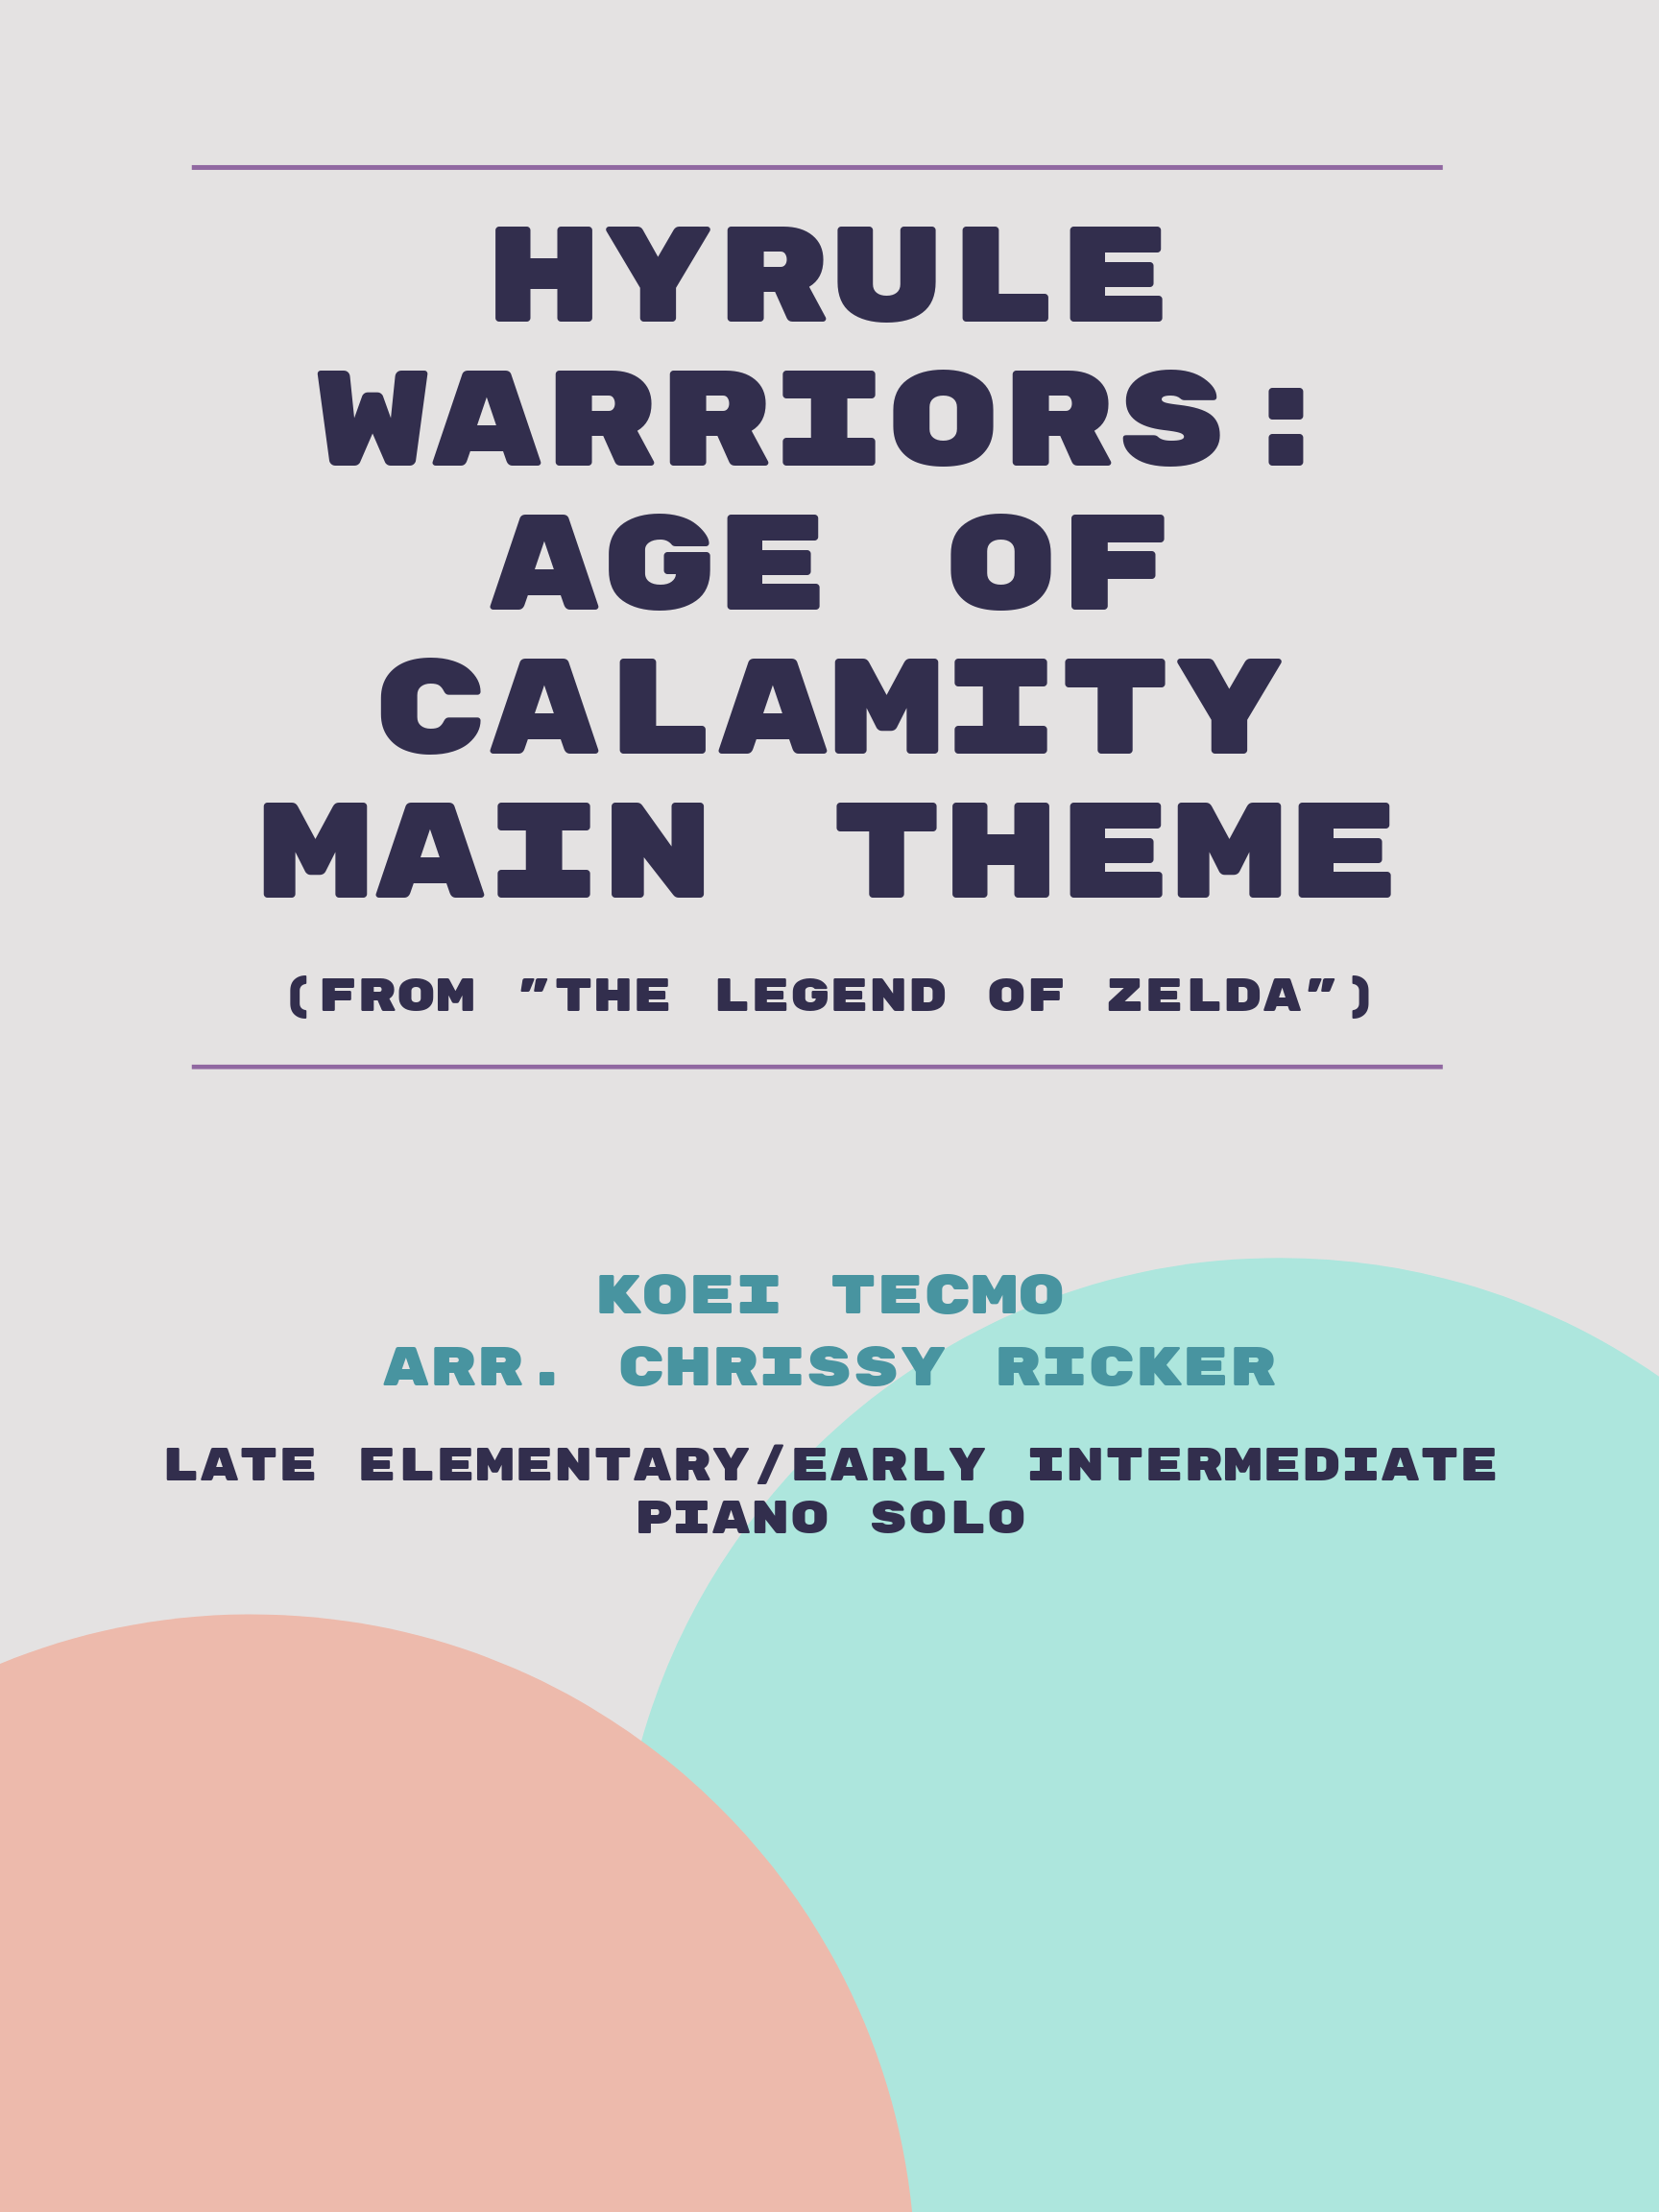 Hyrule Warriors: Age of Calamity Main Theme by Koei Tecmo